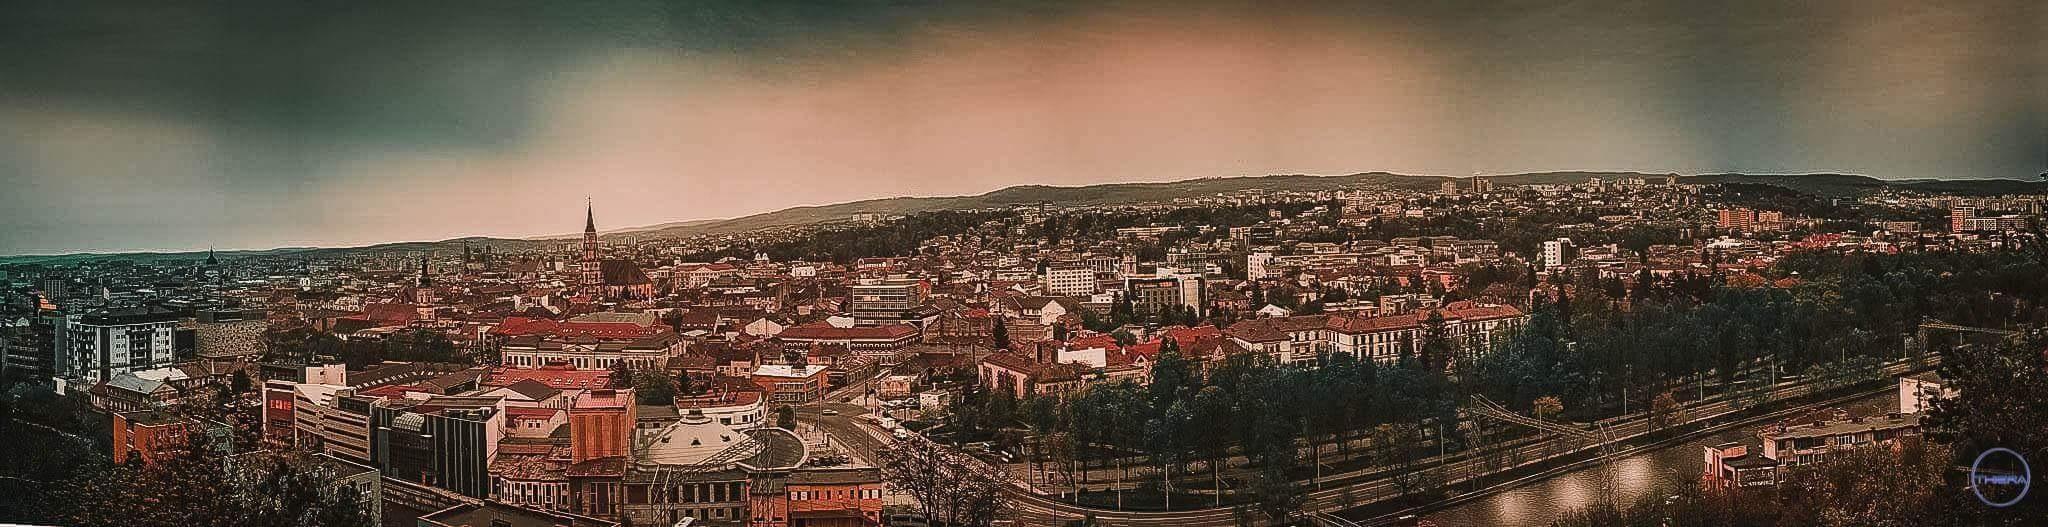 Amazing view of Cluj.  by Tunyogi I. György